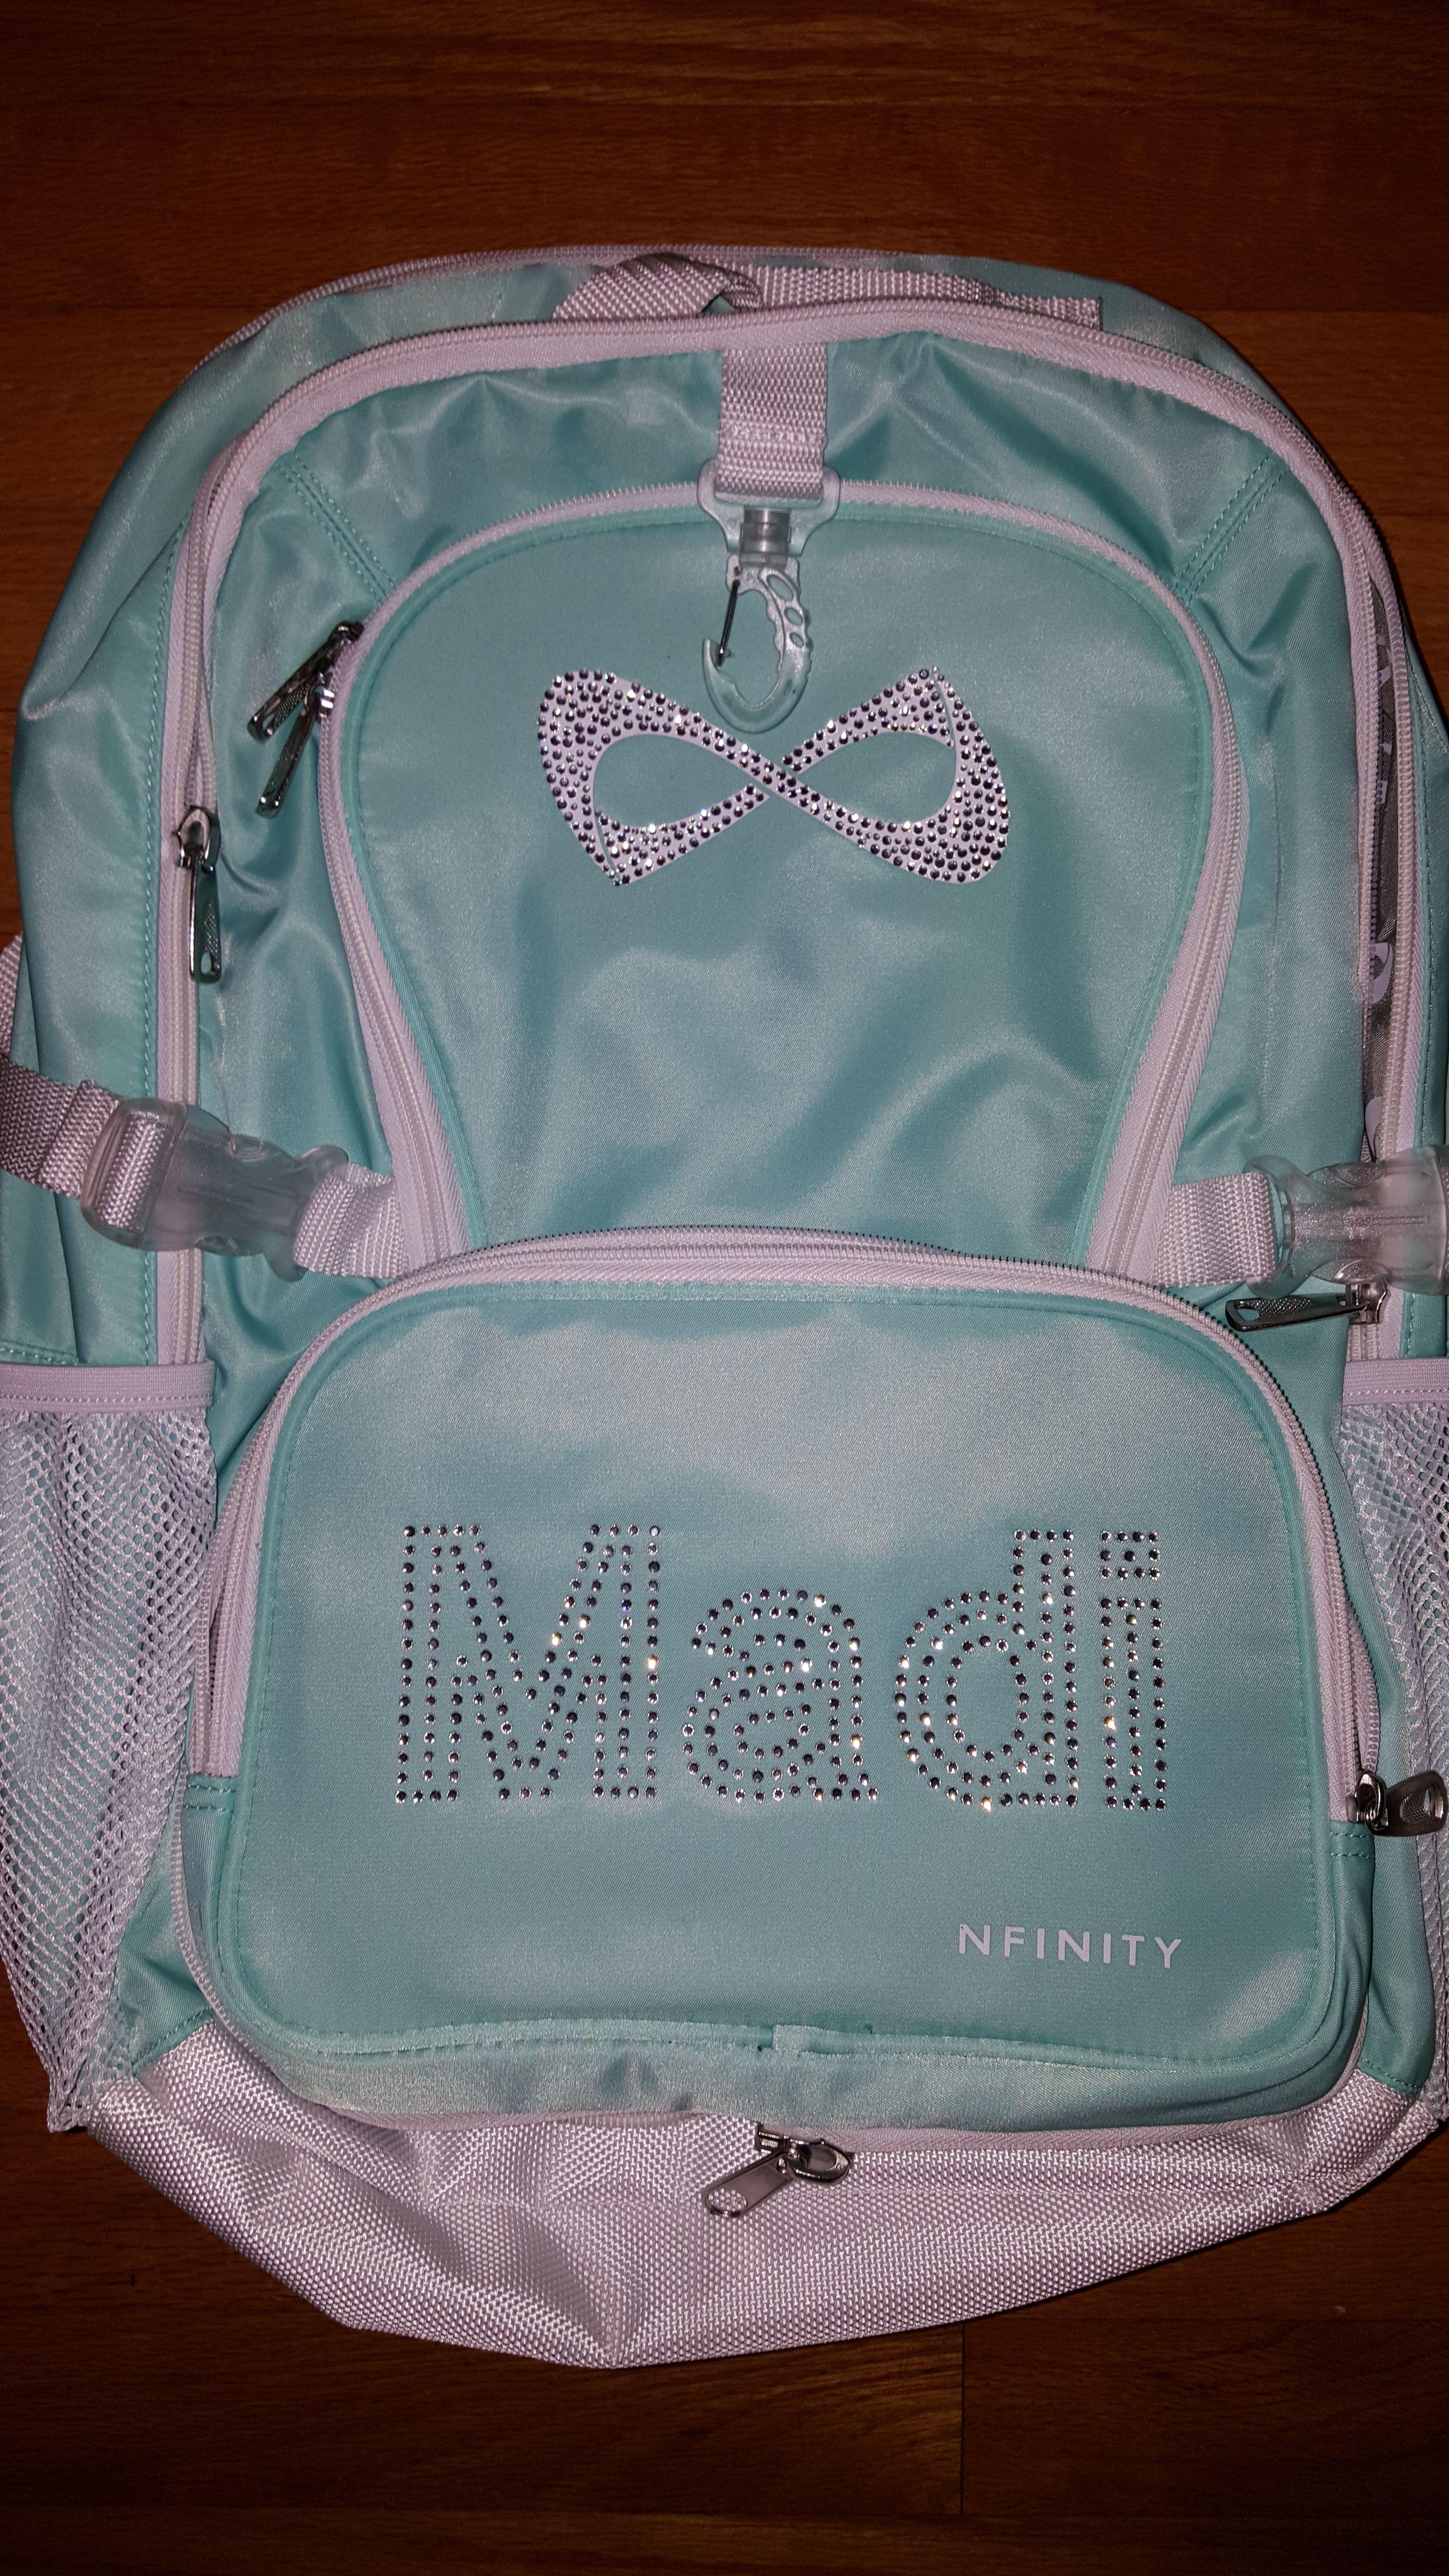 1315adff2c04 Pin by Brooklyn Vaske on cheer | Cheer backpack, Cheer outfits, Cheer